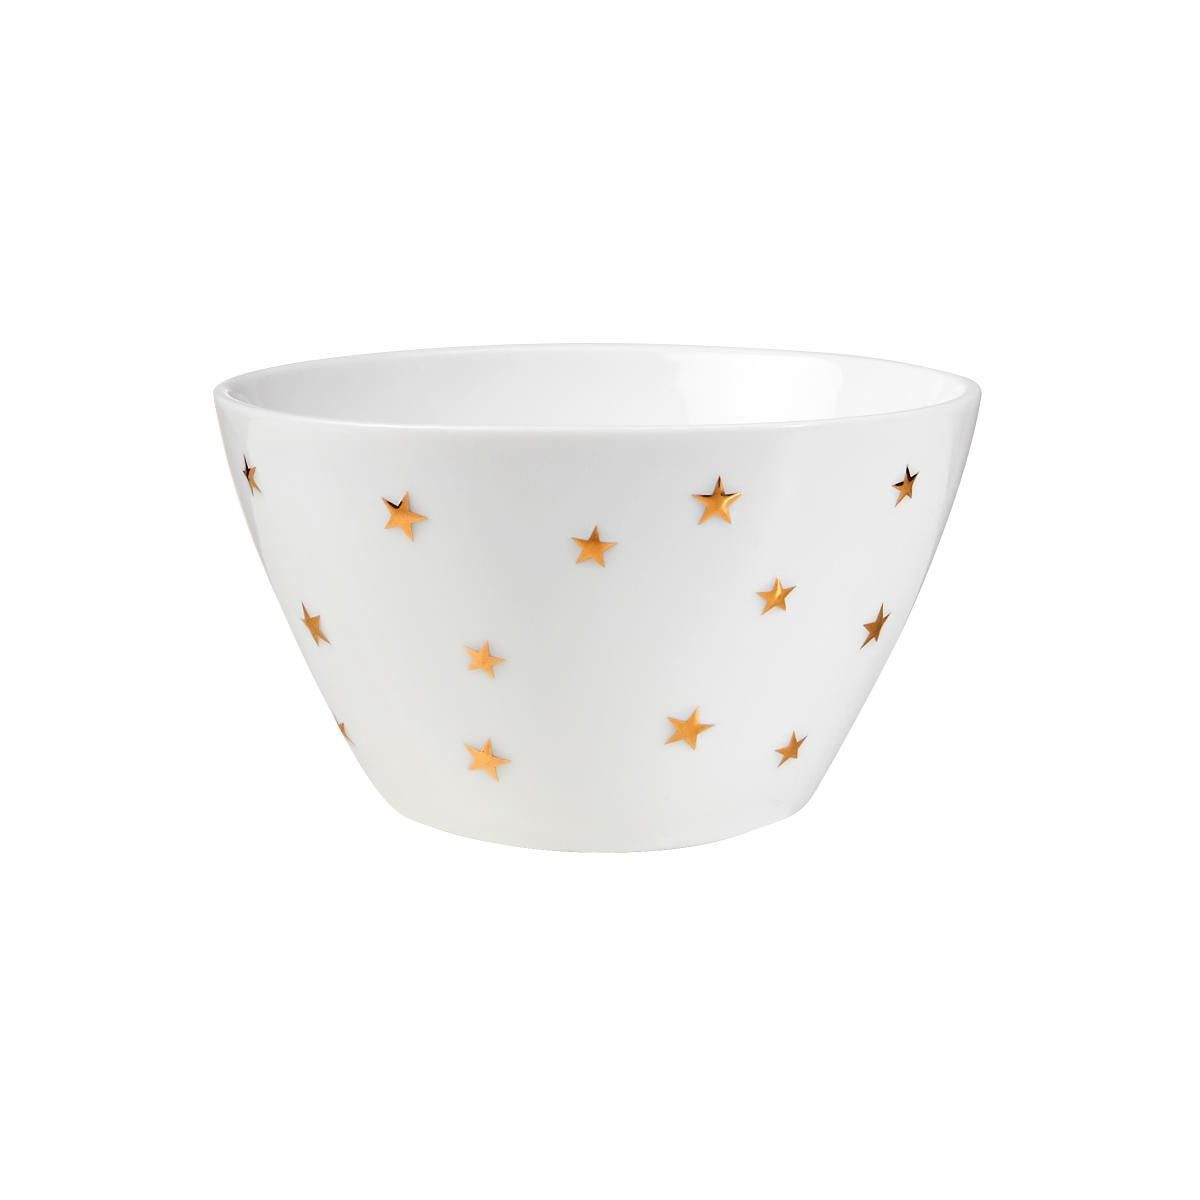 BUTLERS GOLDEN STAR »Schale Ø 13,5 cm«